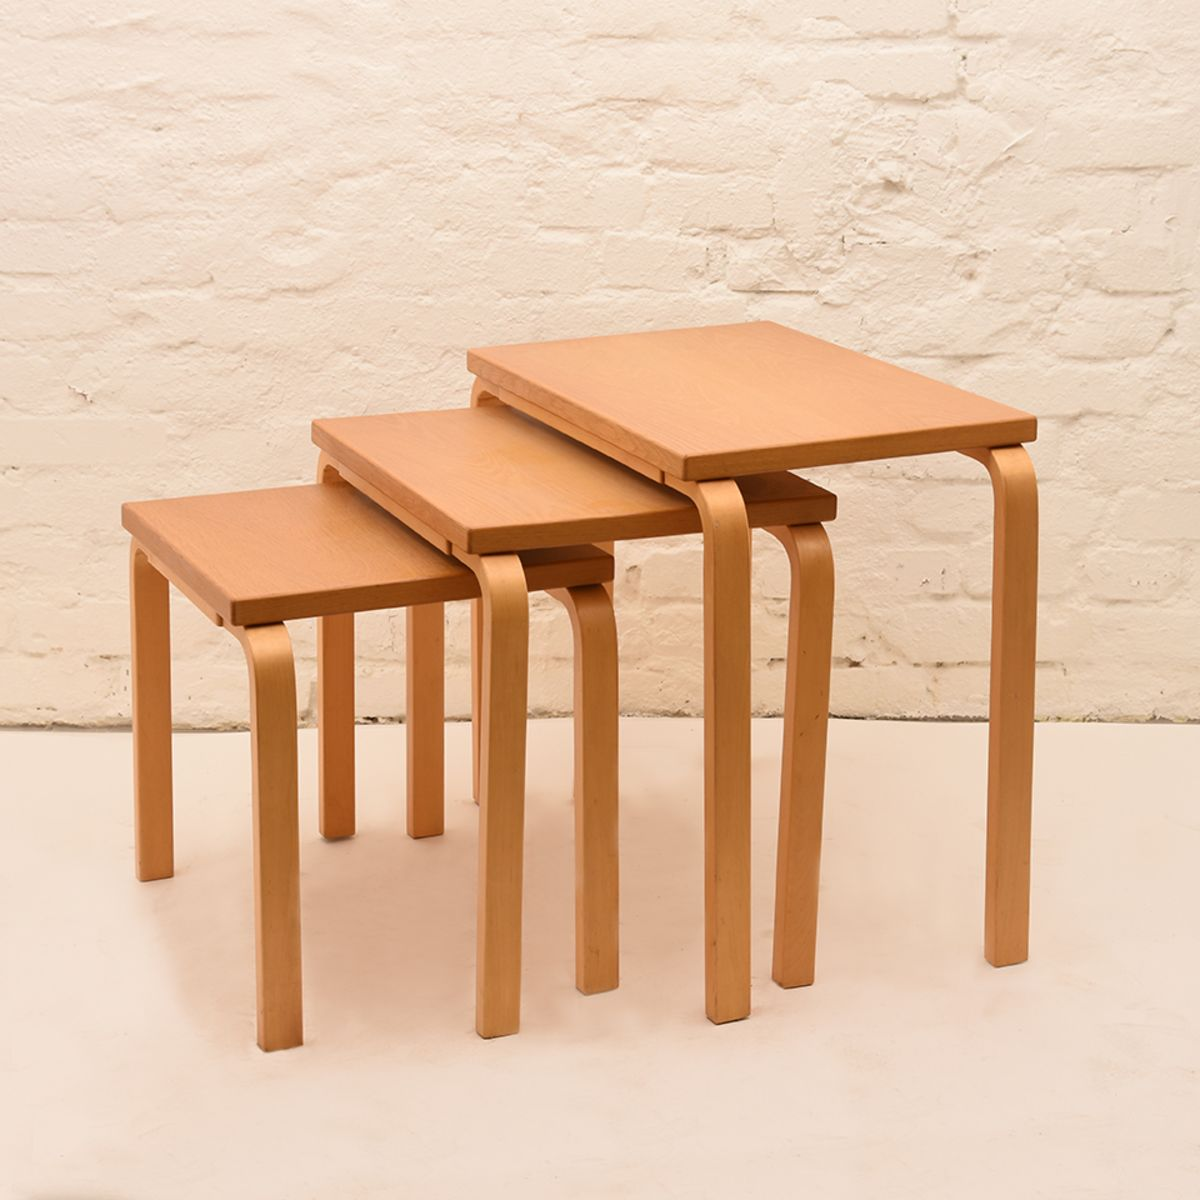 Alvar-Aalto_Nesting-Tables-01